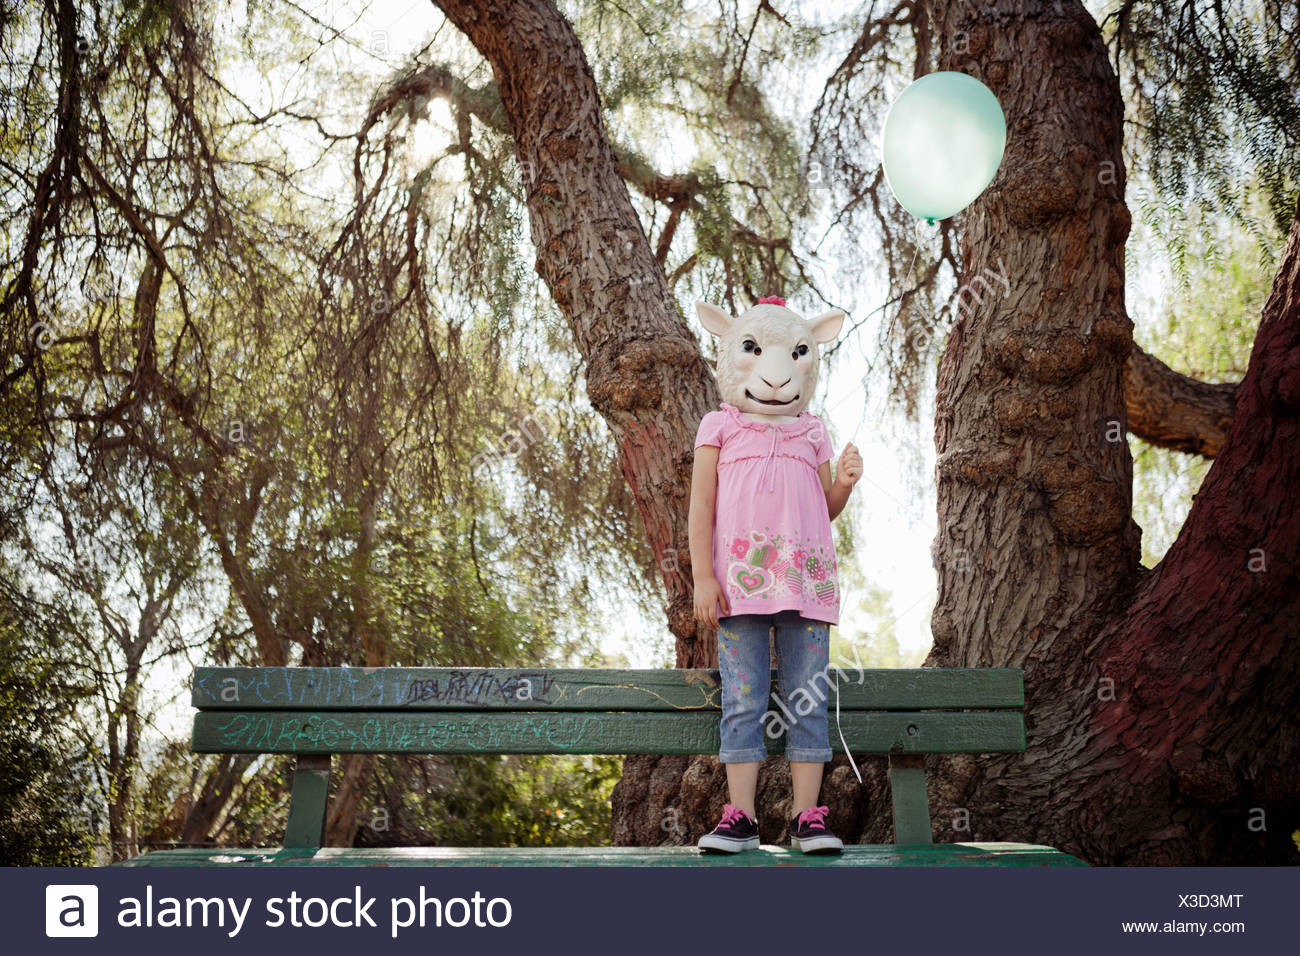 Niño disfrazado de máscara de cabeza de oveja Imagen De Stock